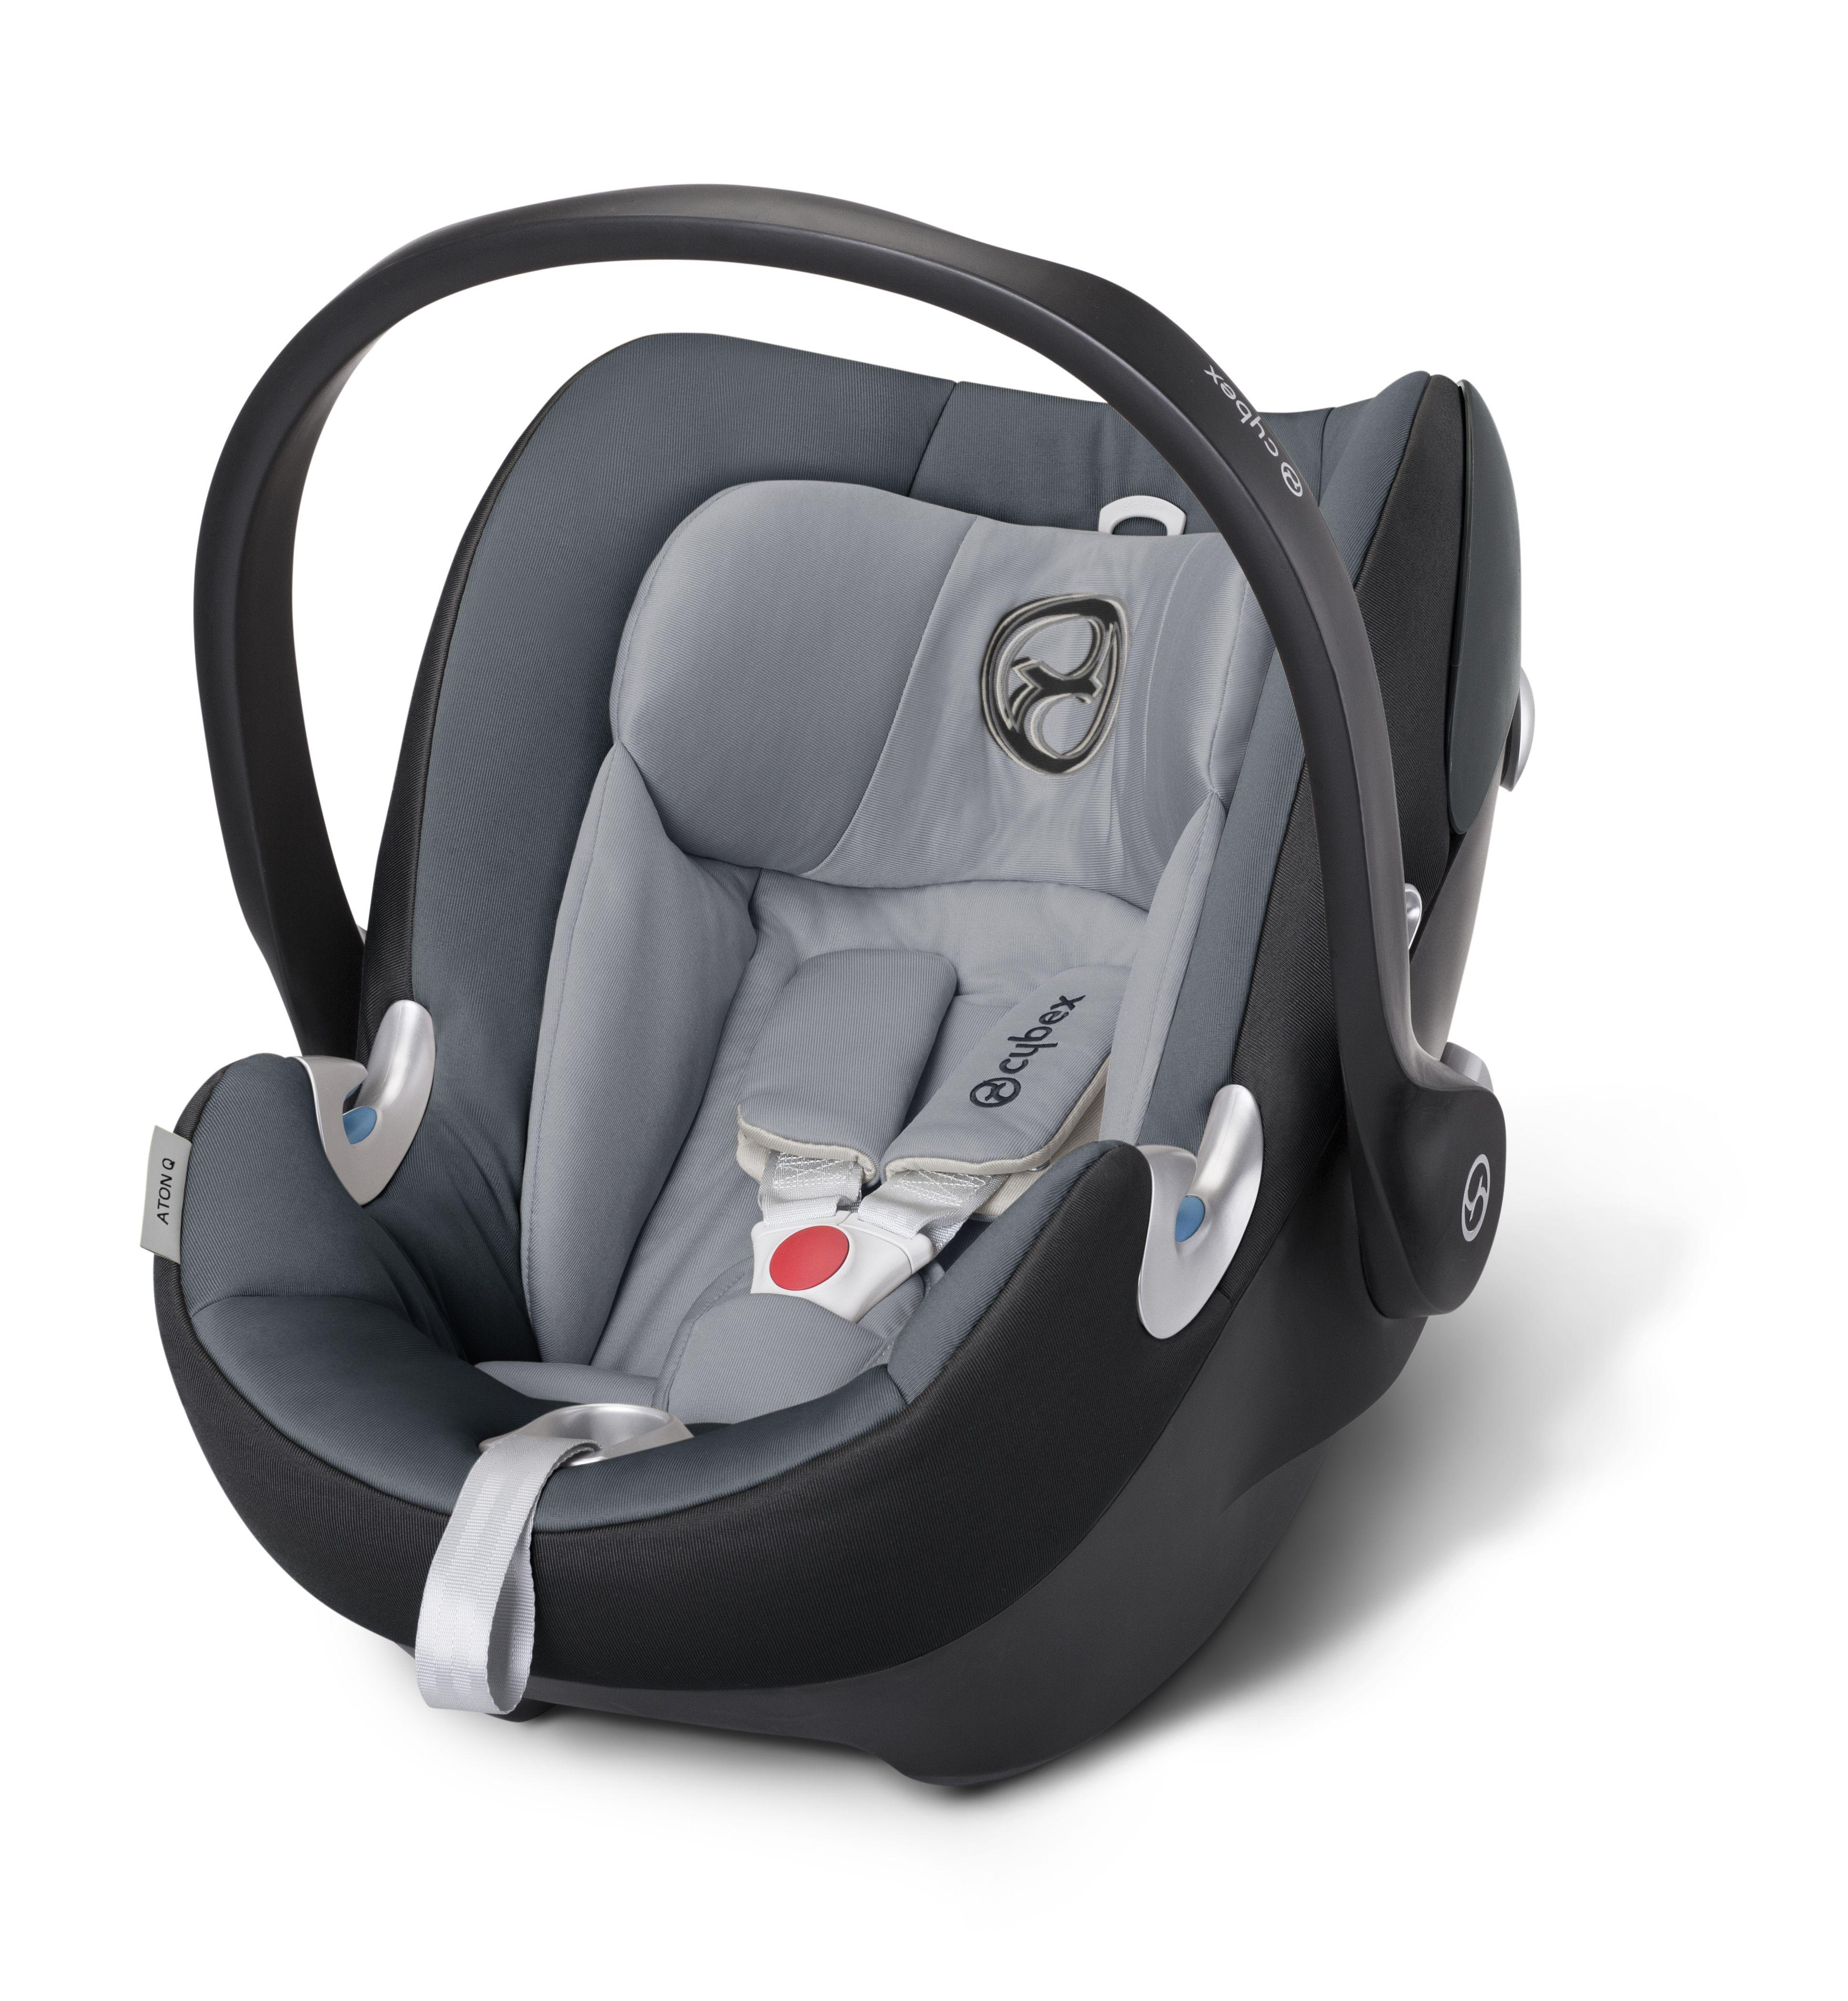 Cybex Aton Q Moondust Baby Car Seats Car Seats Baby Seat